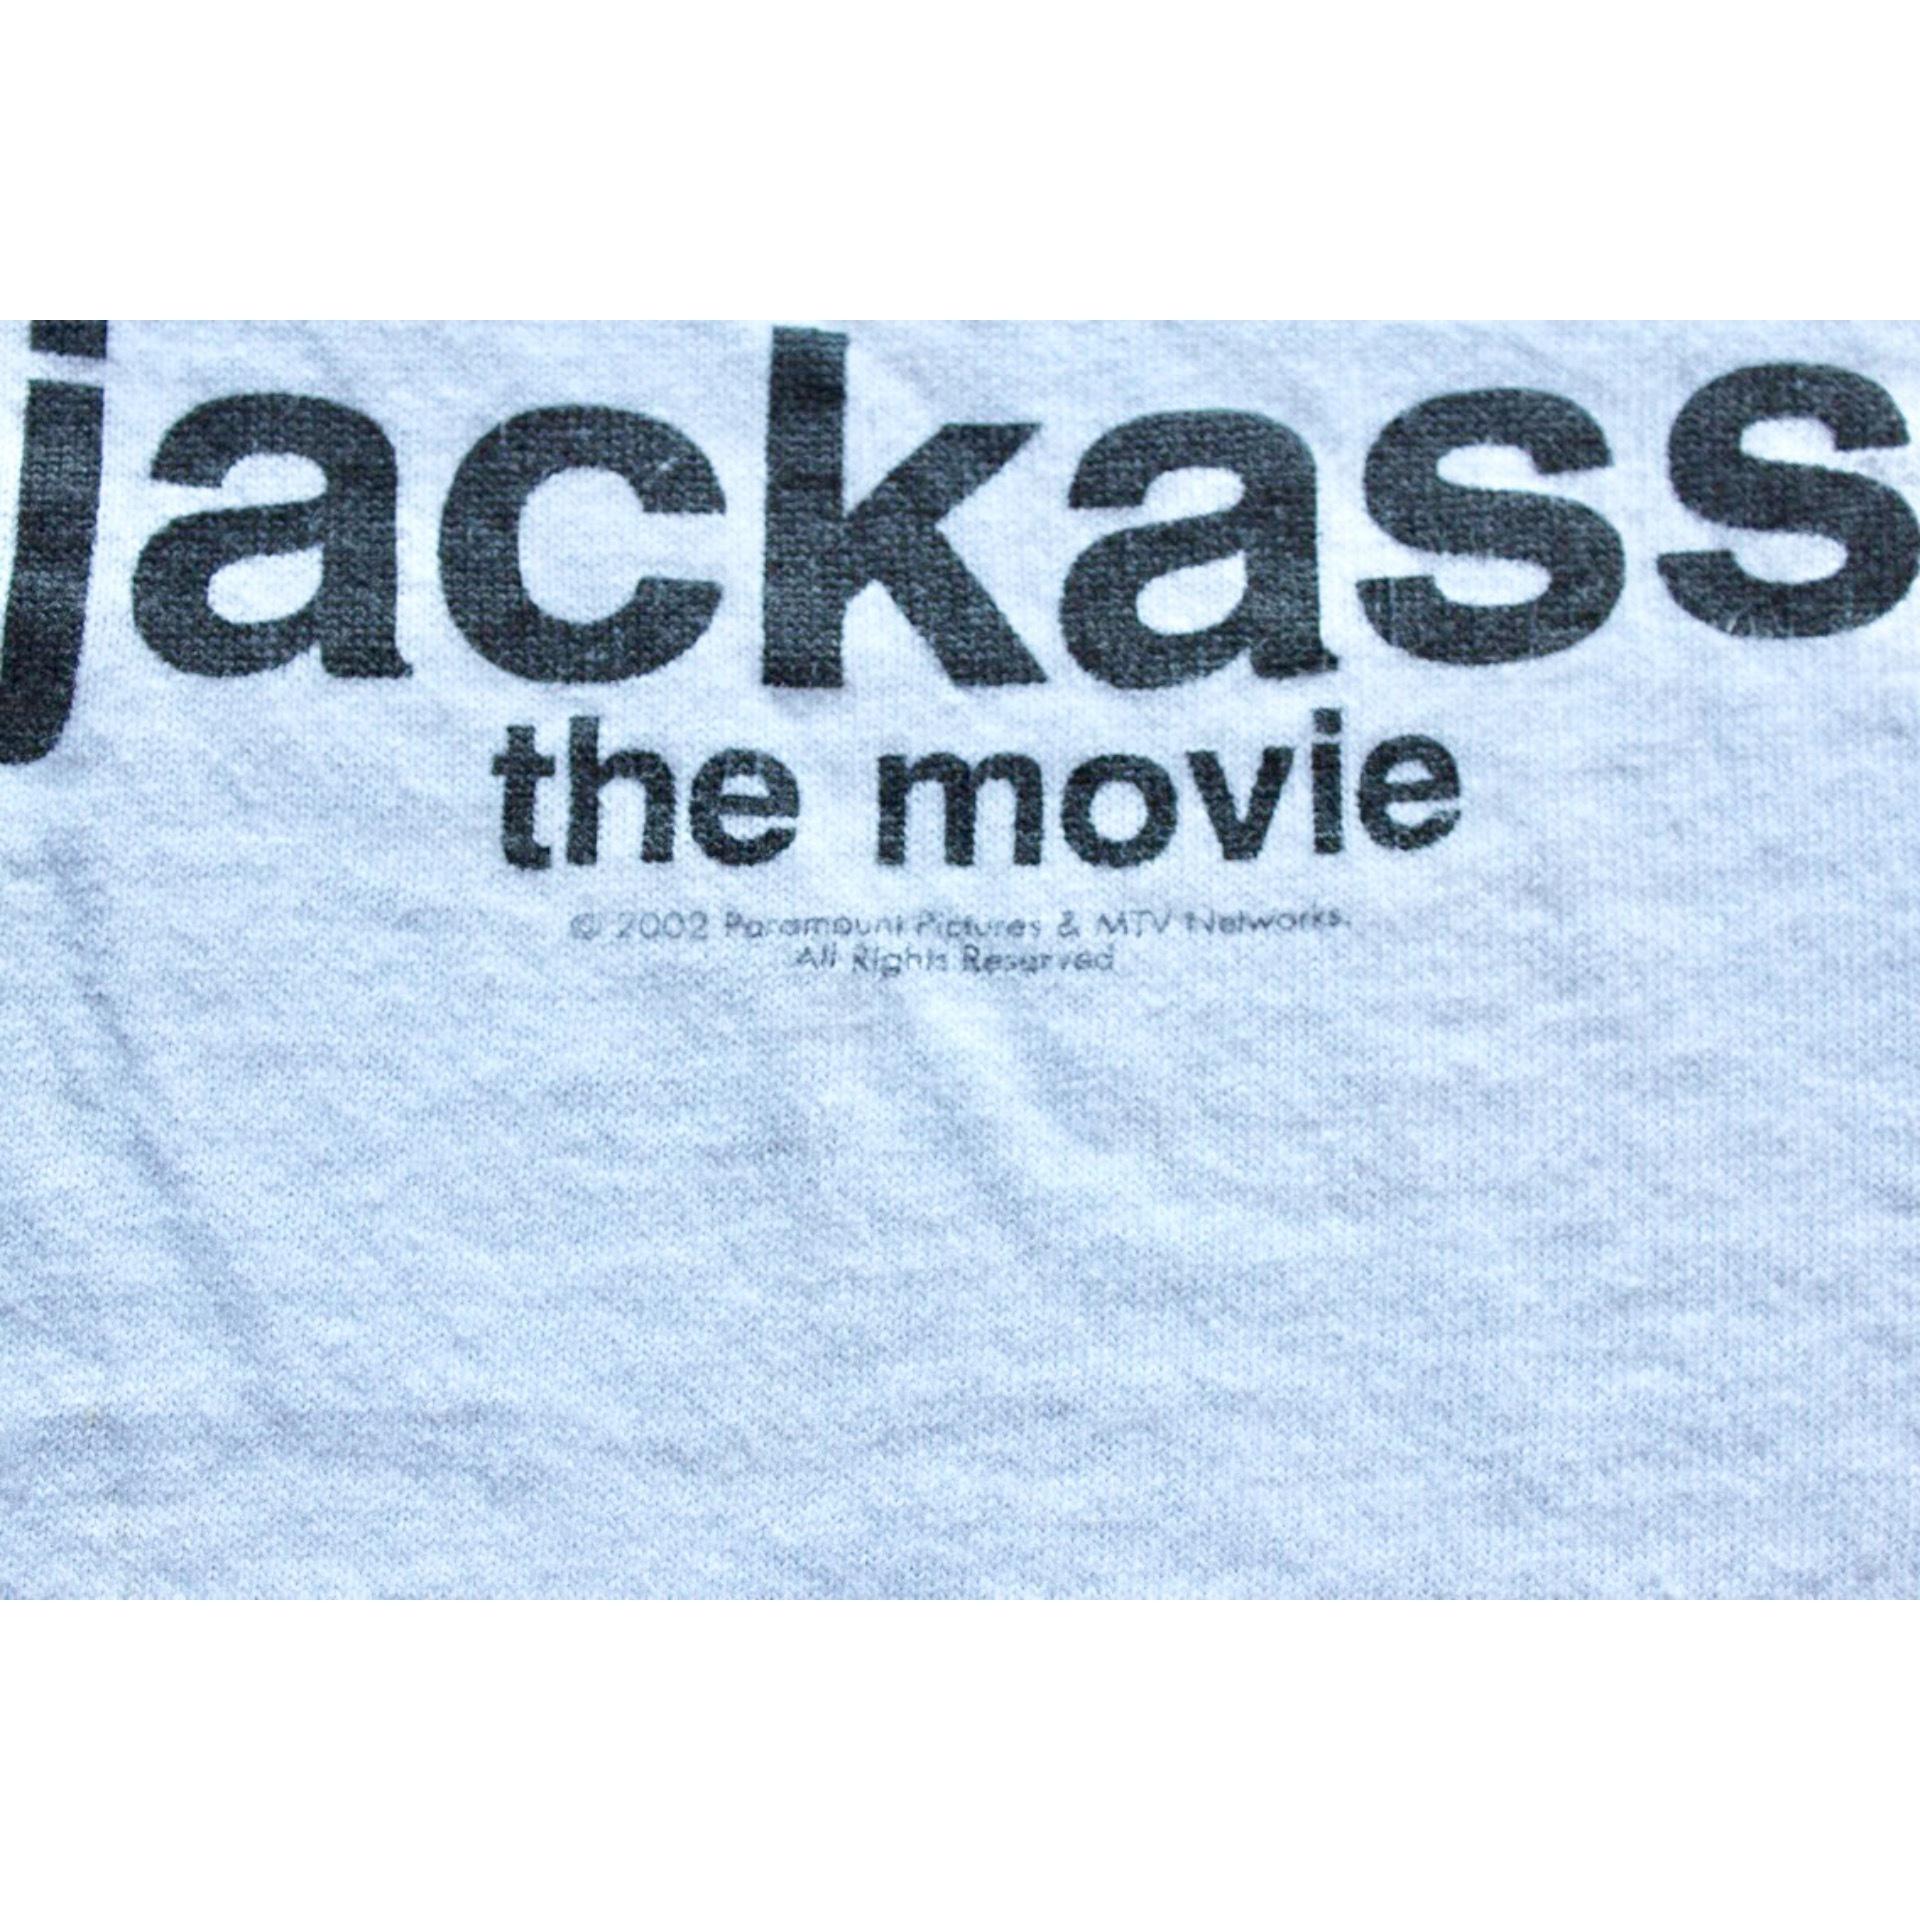 Vintage jackass t shirt